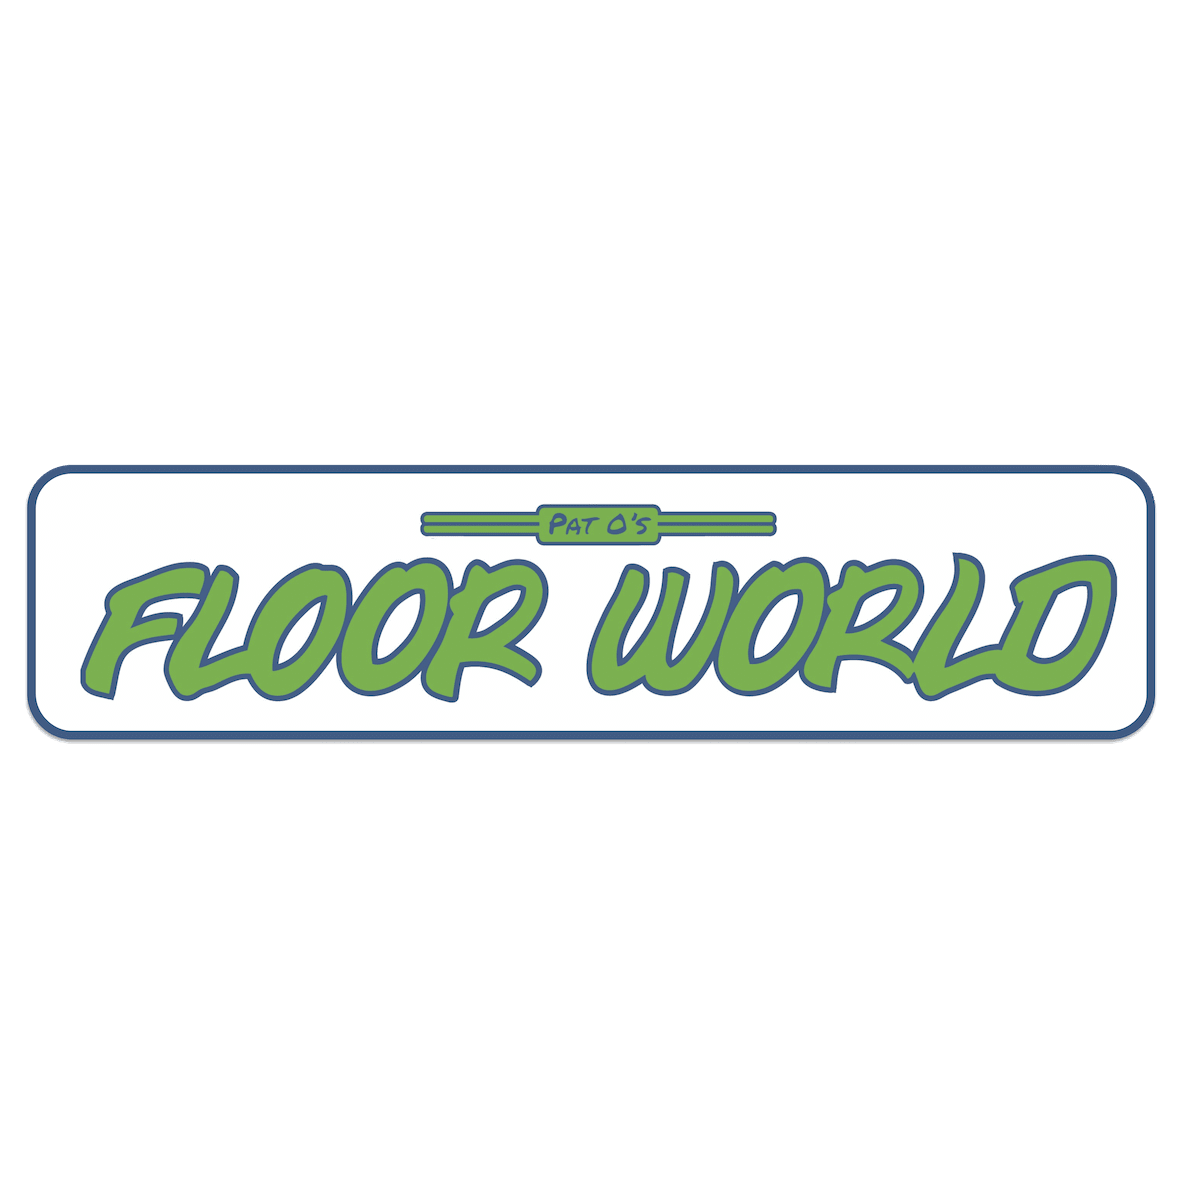 Pat O'S Floor World - East Syracuse, NY - Floor Laying & Refinishing